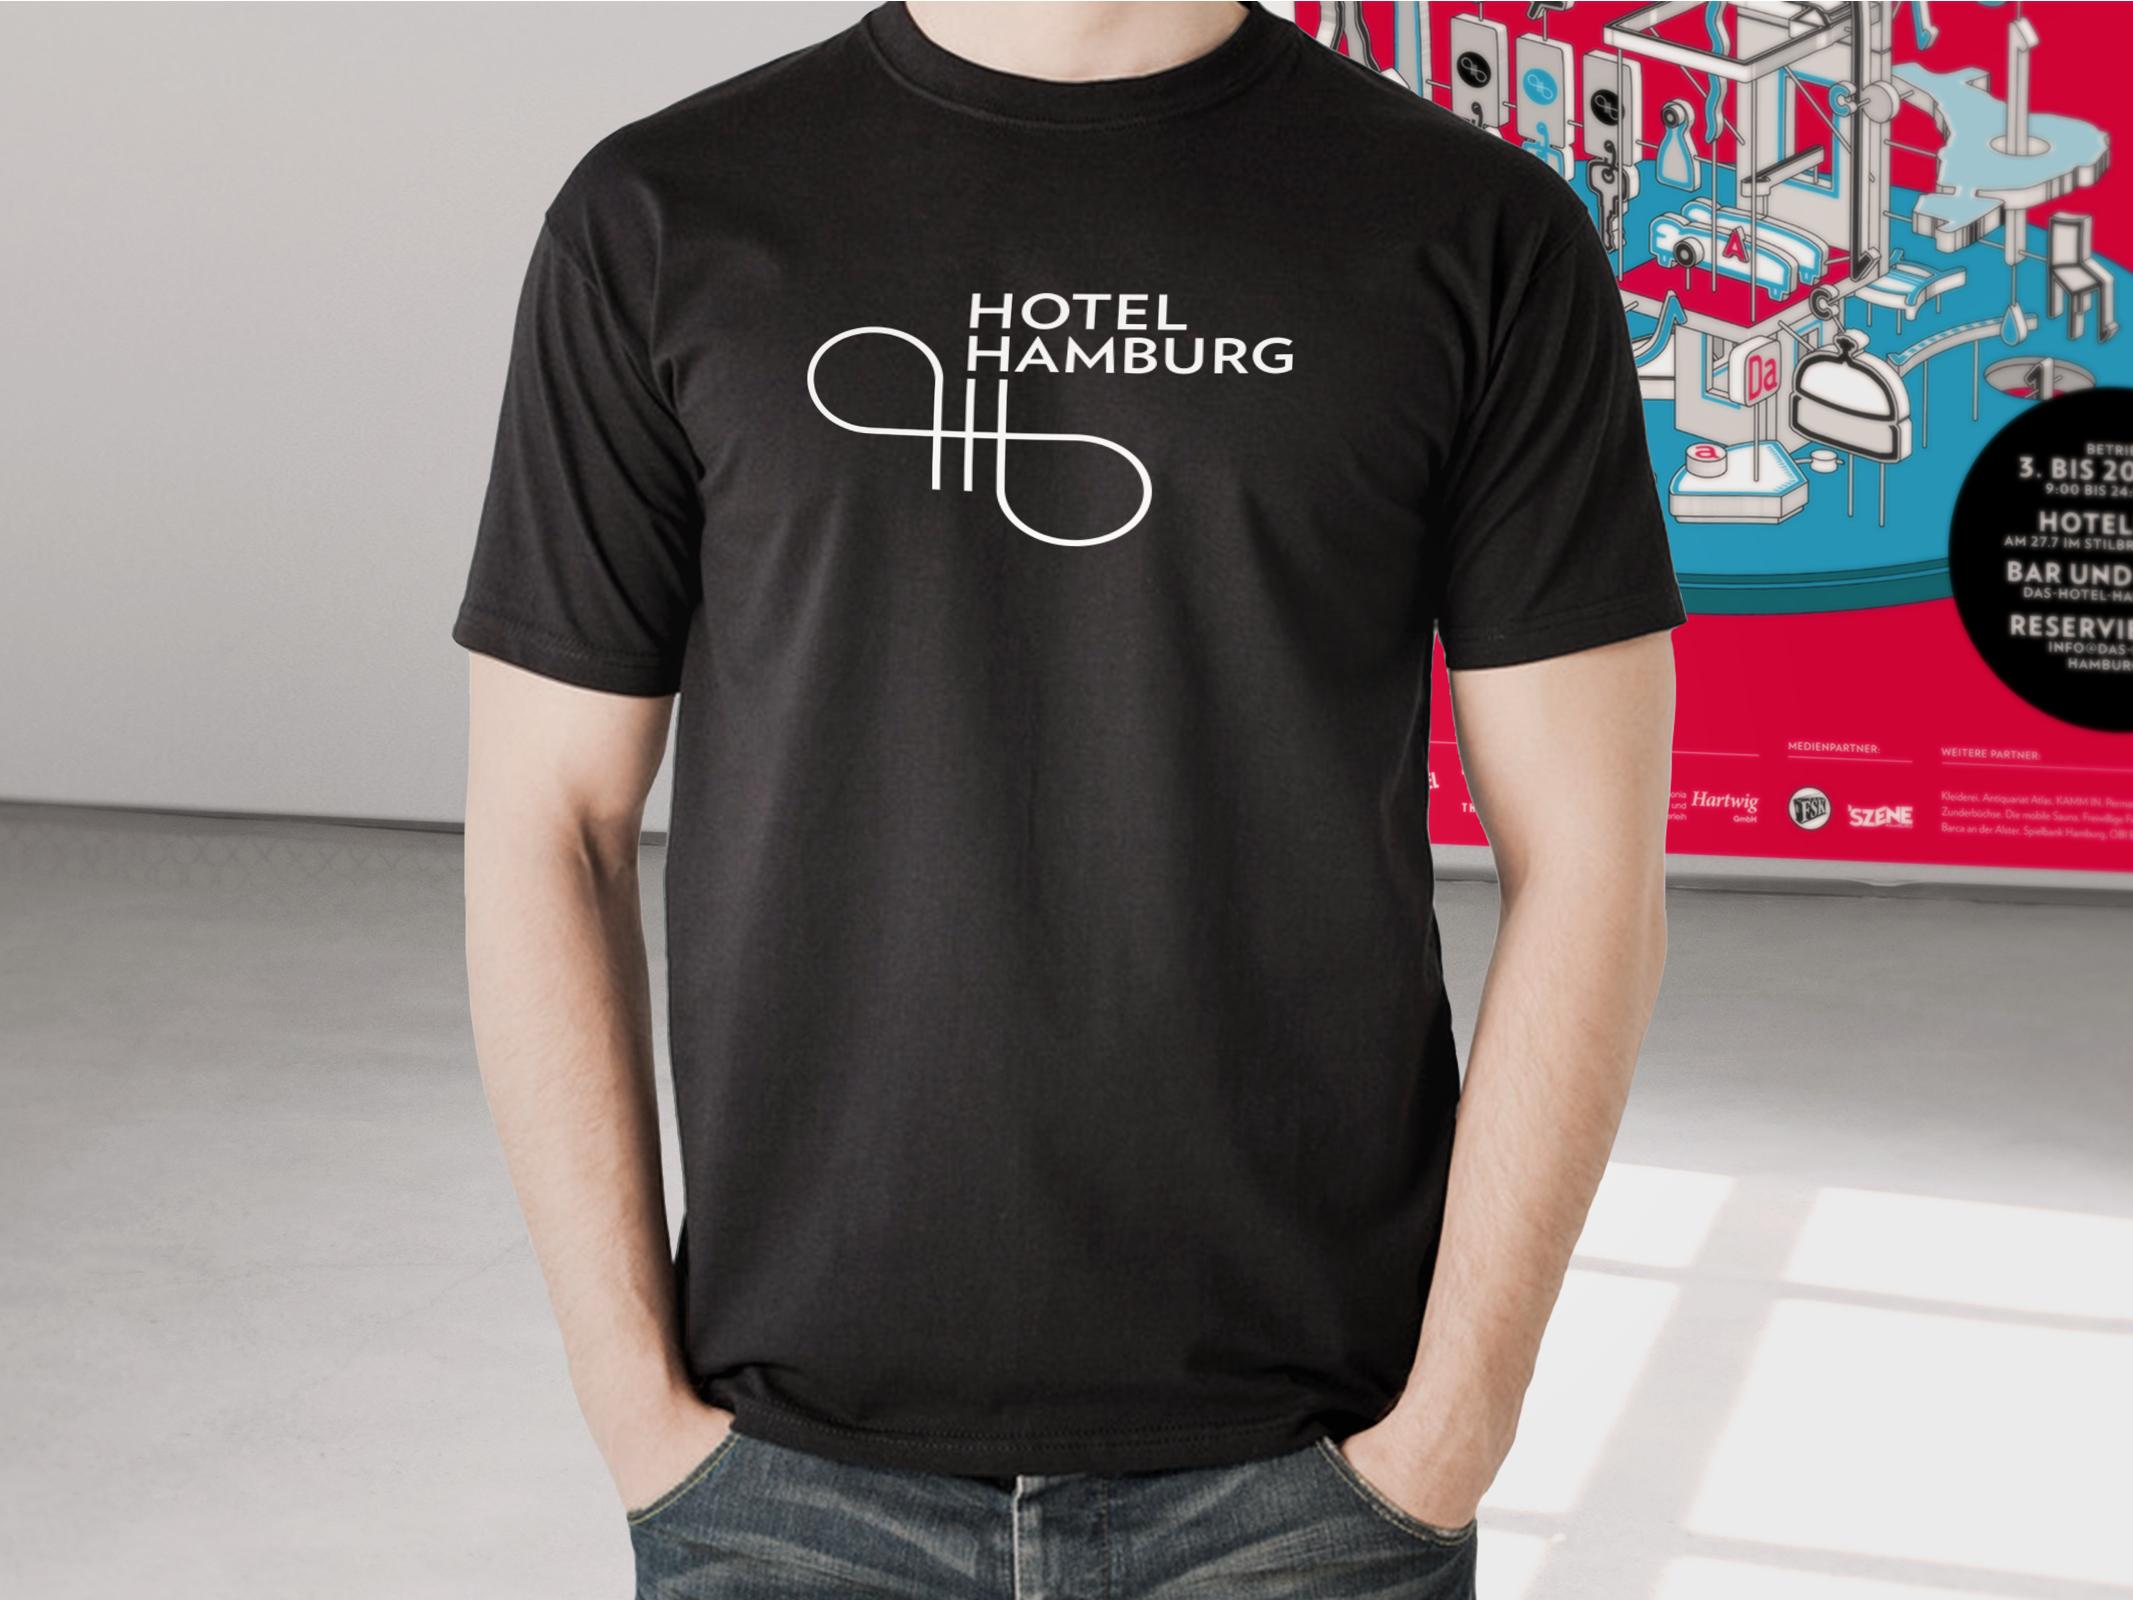 Hotel Hamburg Noroomgallery – Poarangan Brand Design5